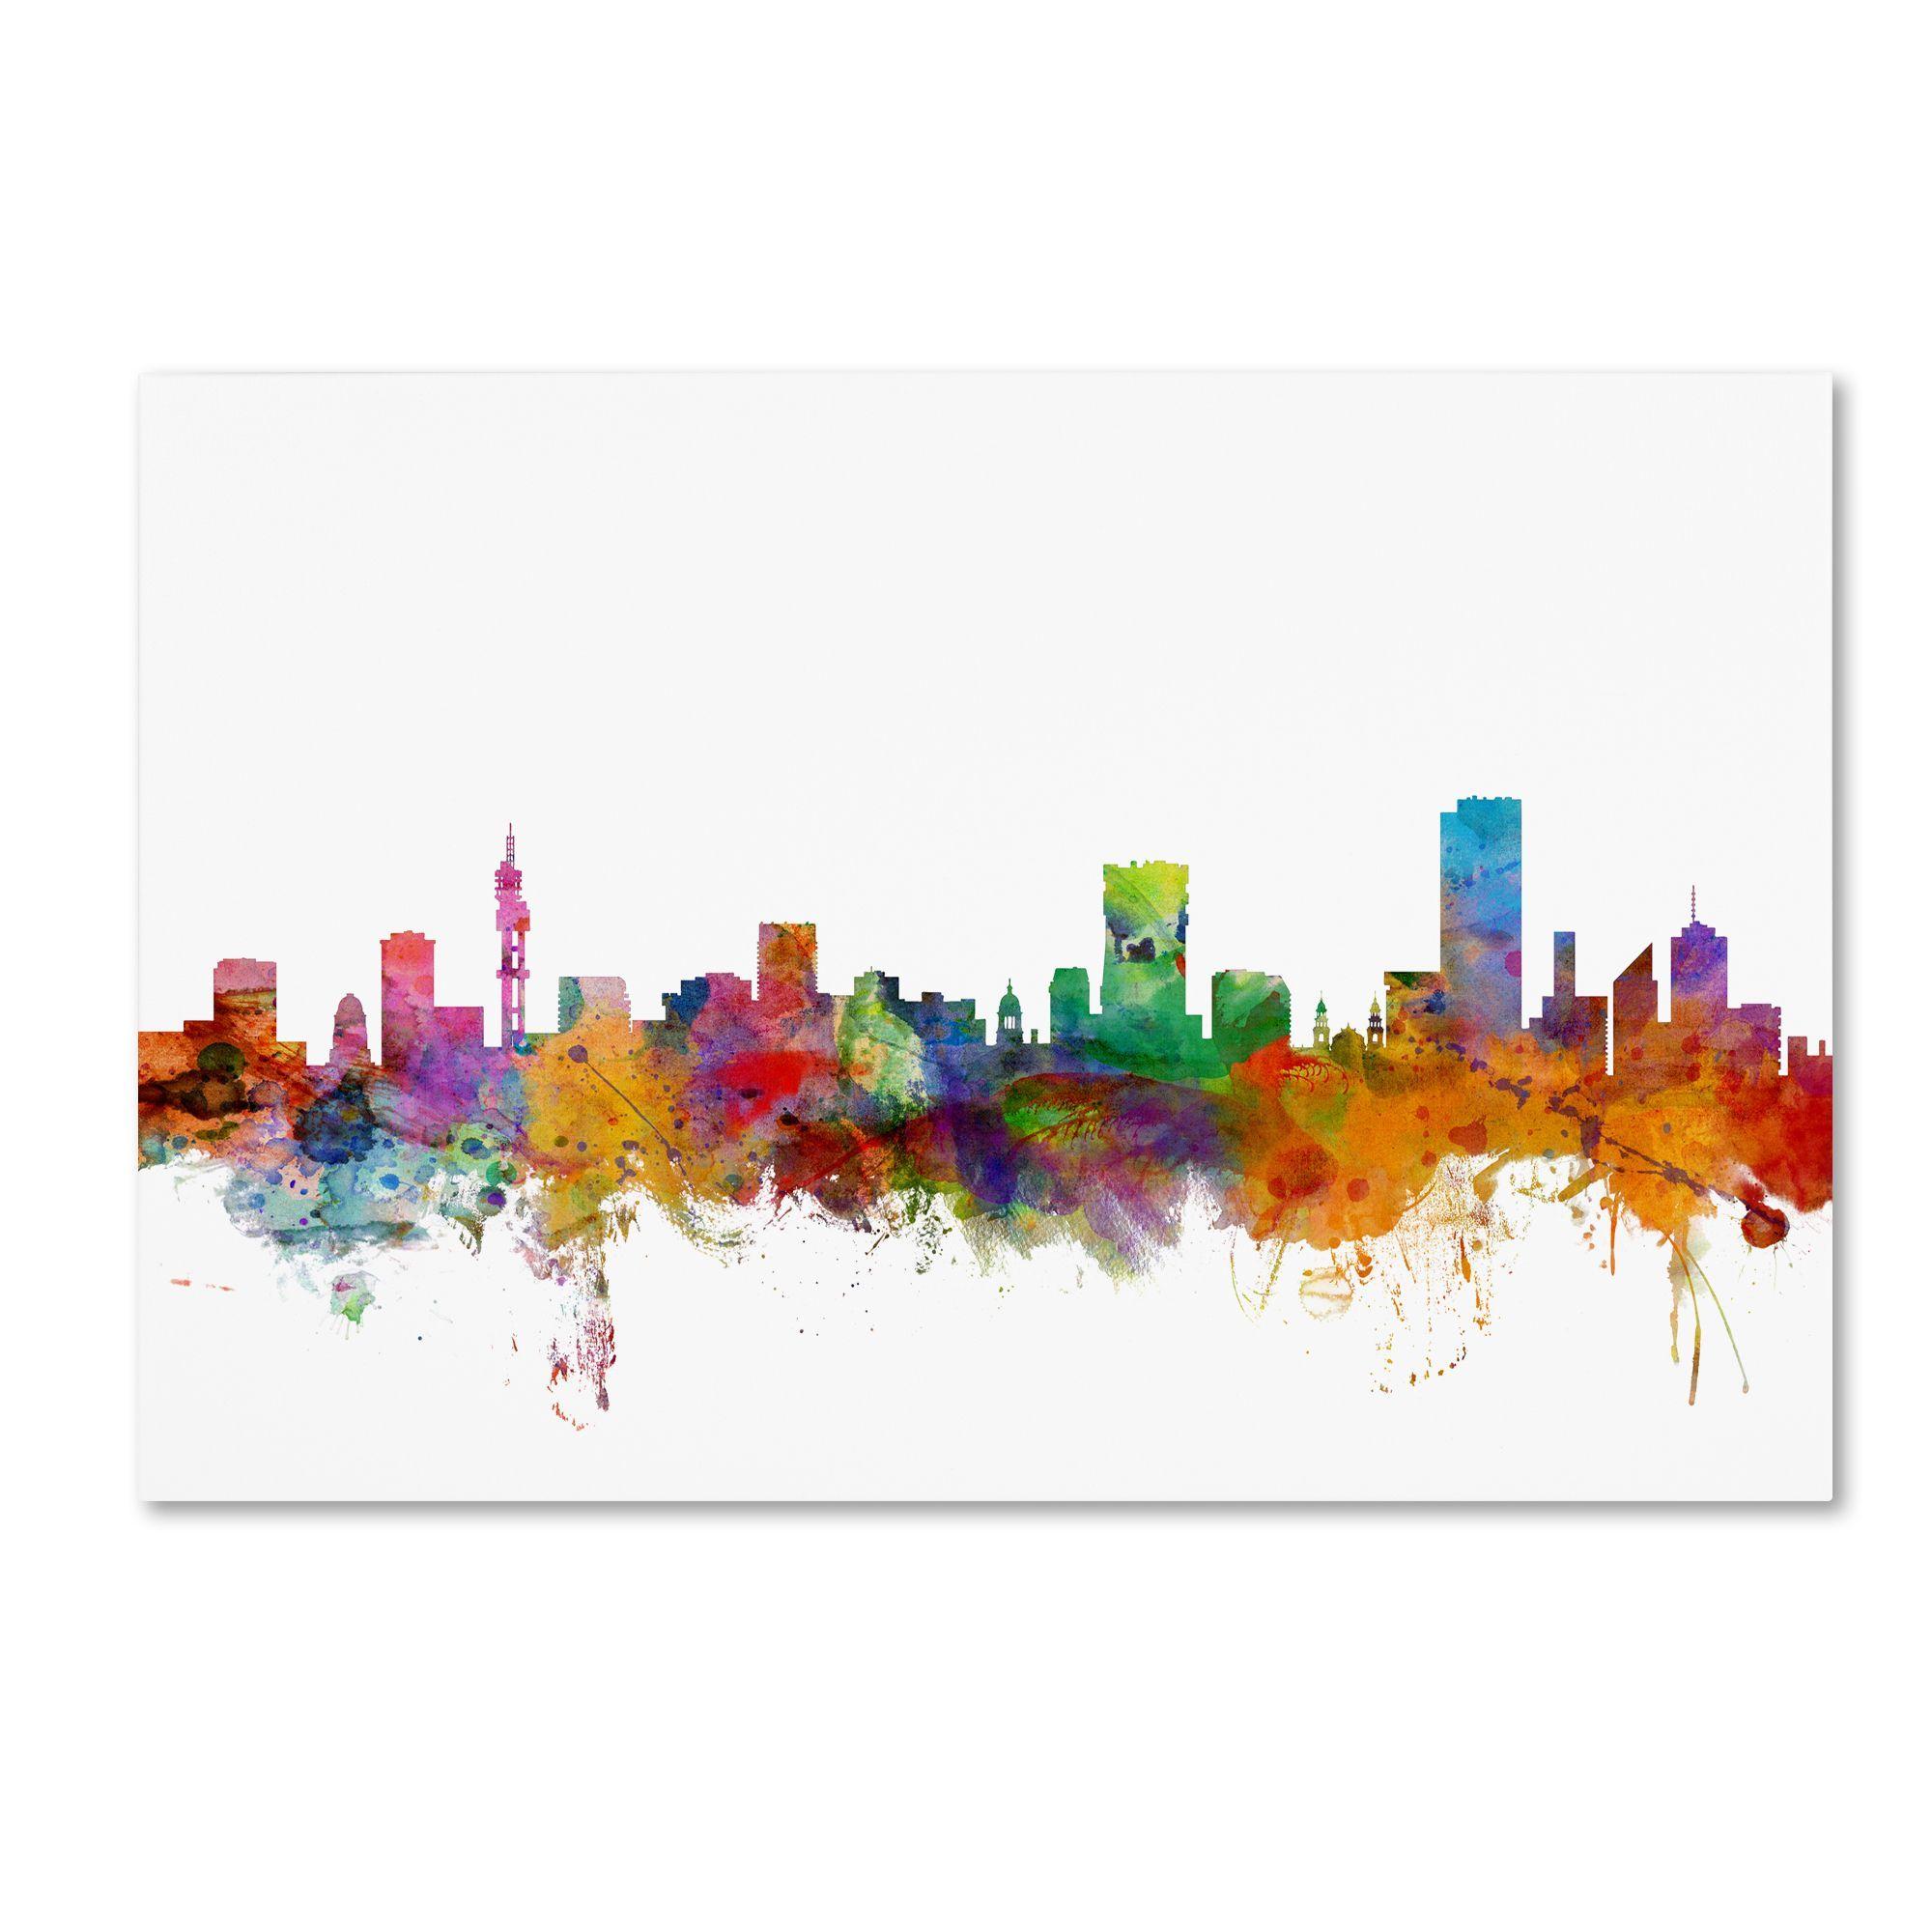 Michael Tompsett 'Pretoria South Africa Skyline' Canvas